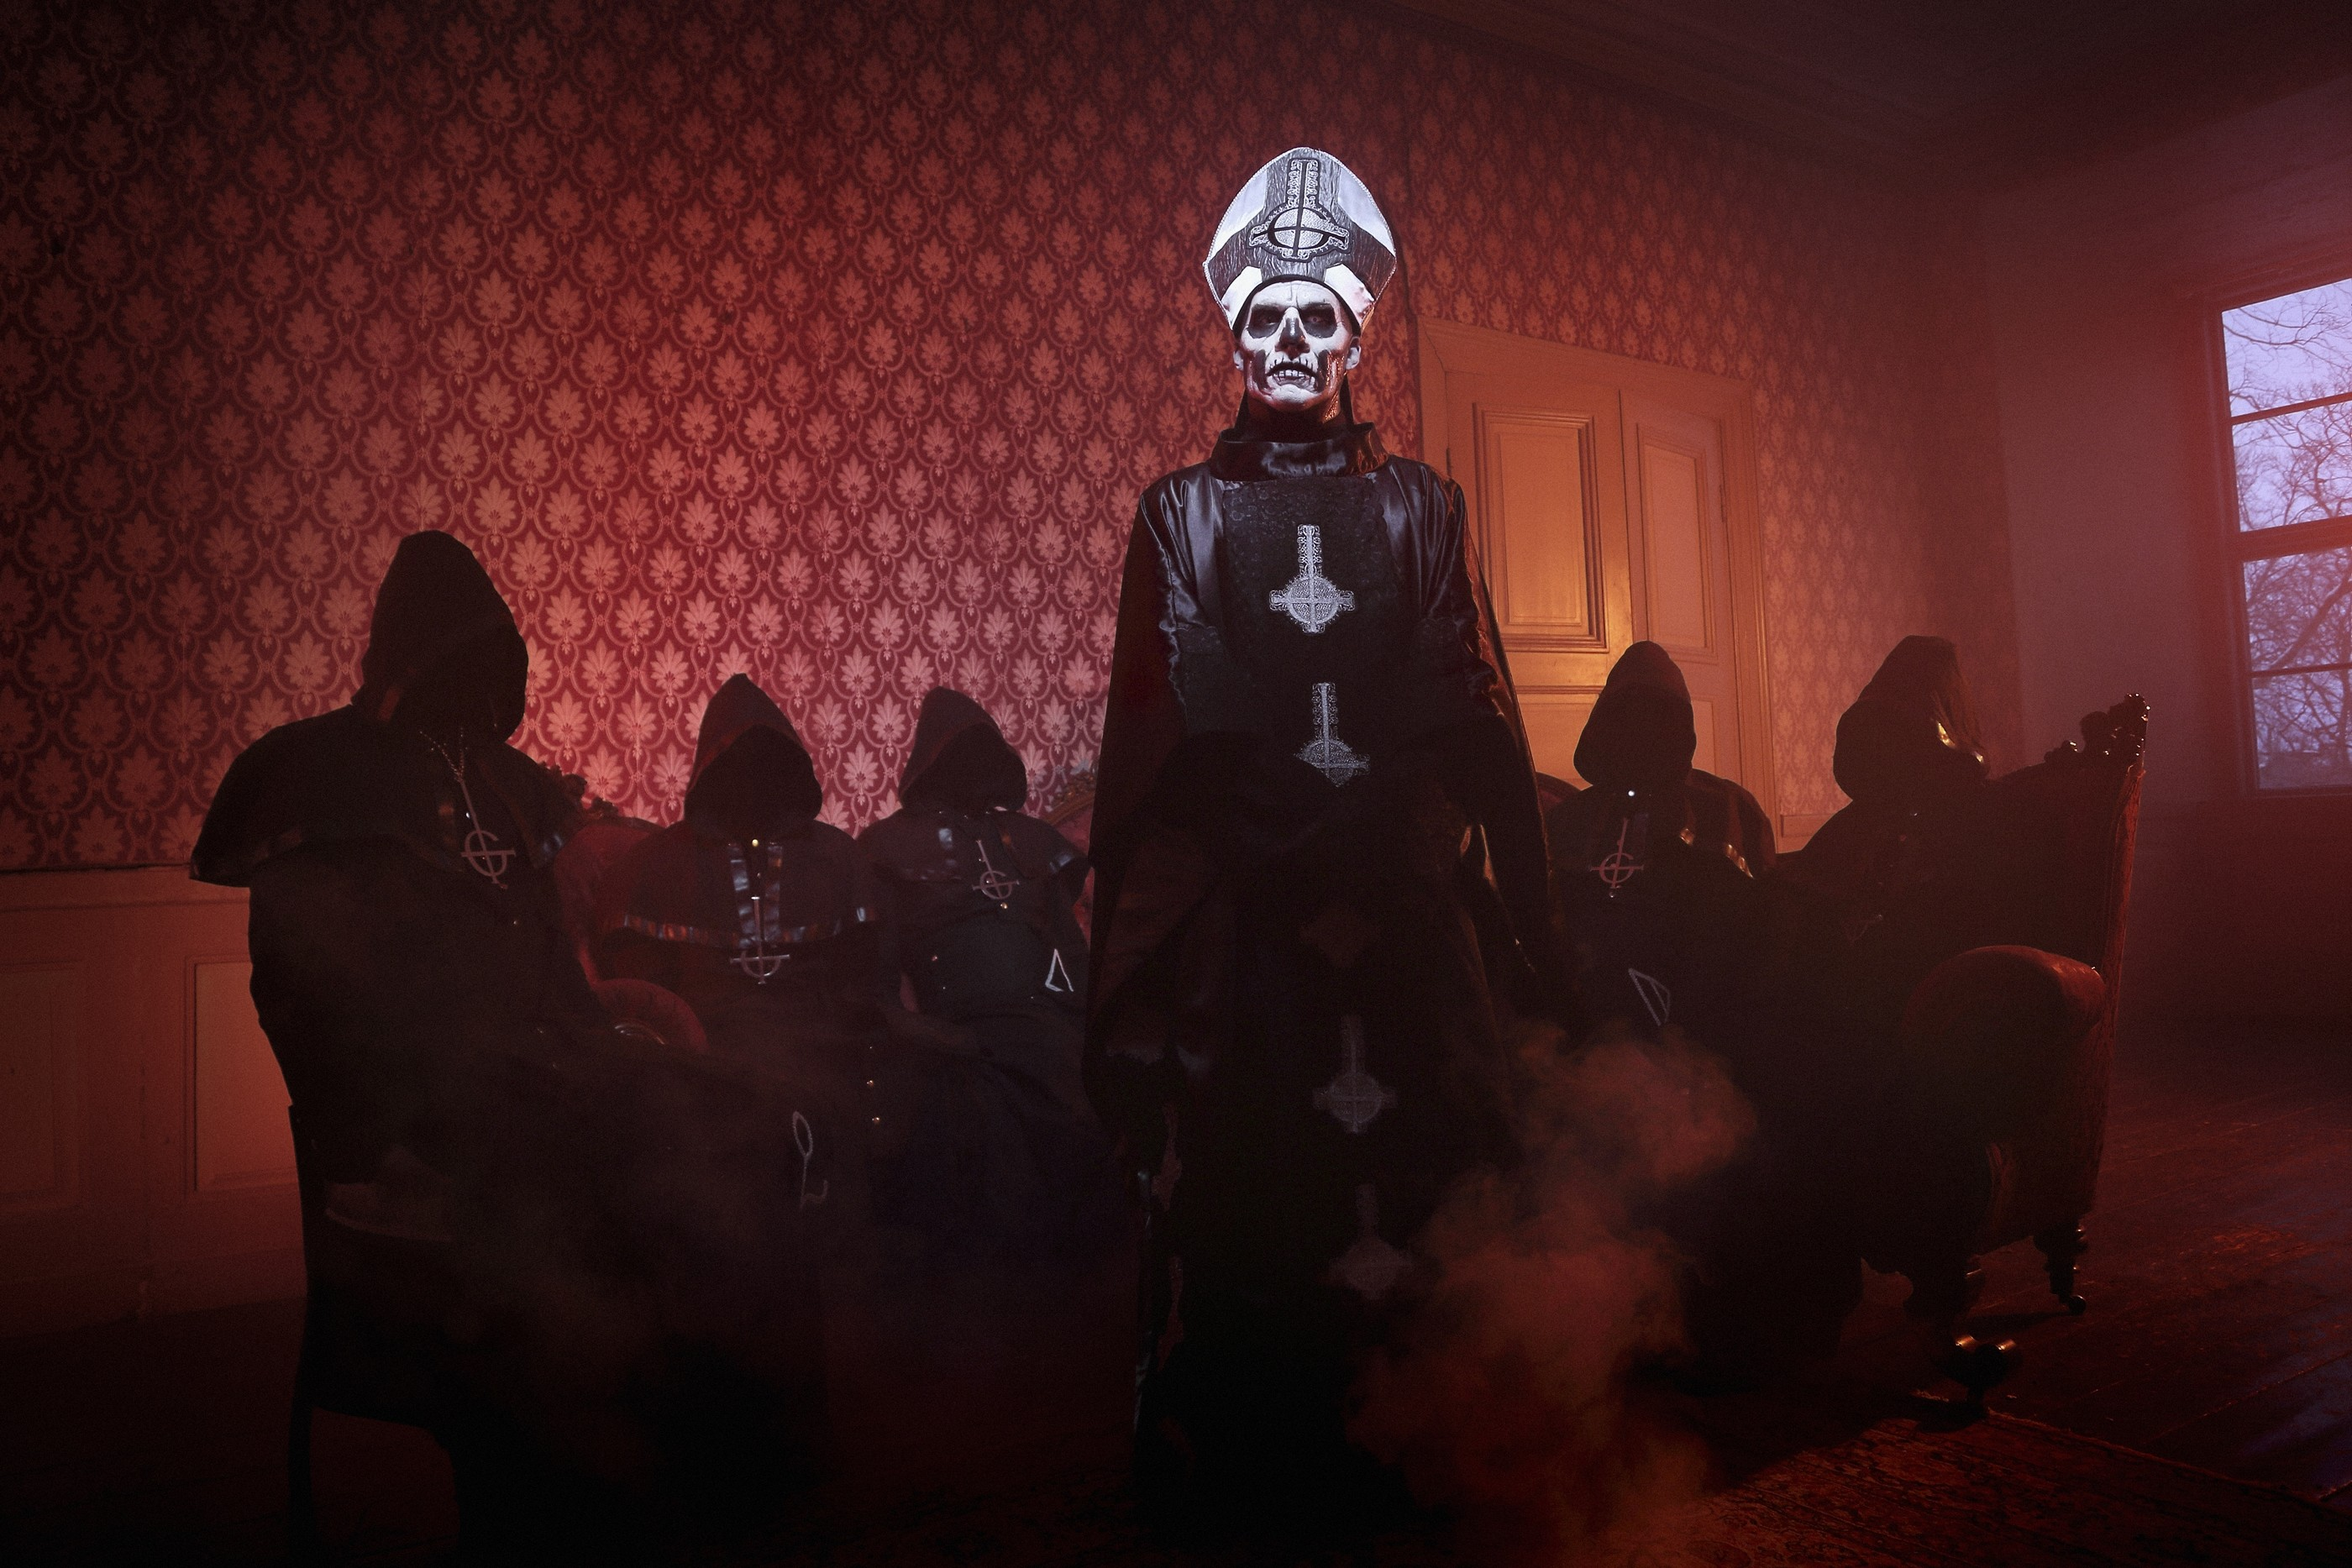 Res: 2800x1867, Music - Ghost Swedish Music Heavy Metal Band Dark Satanic Metal Wallpaper